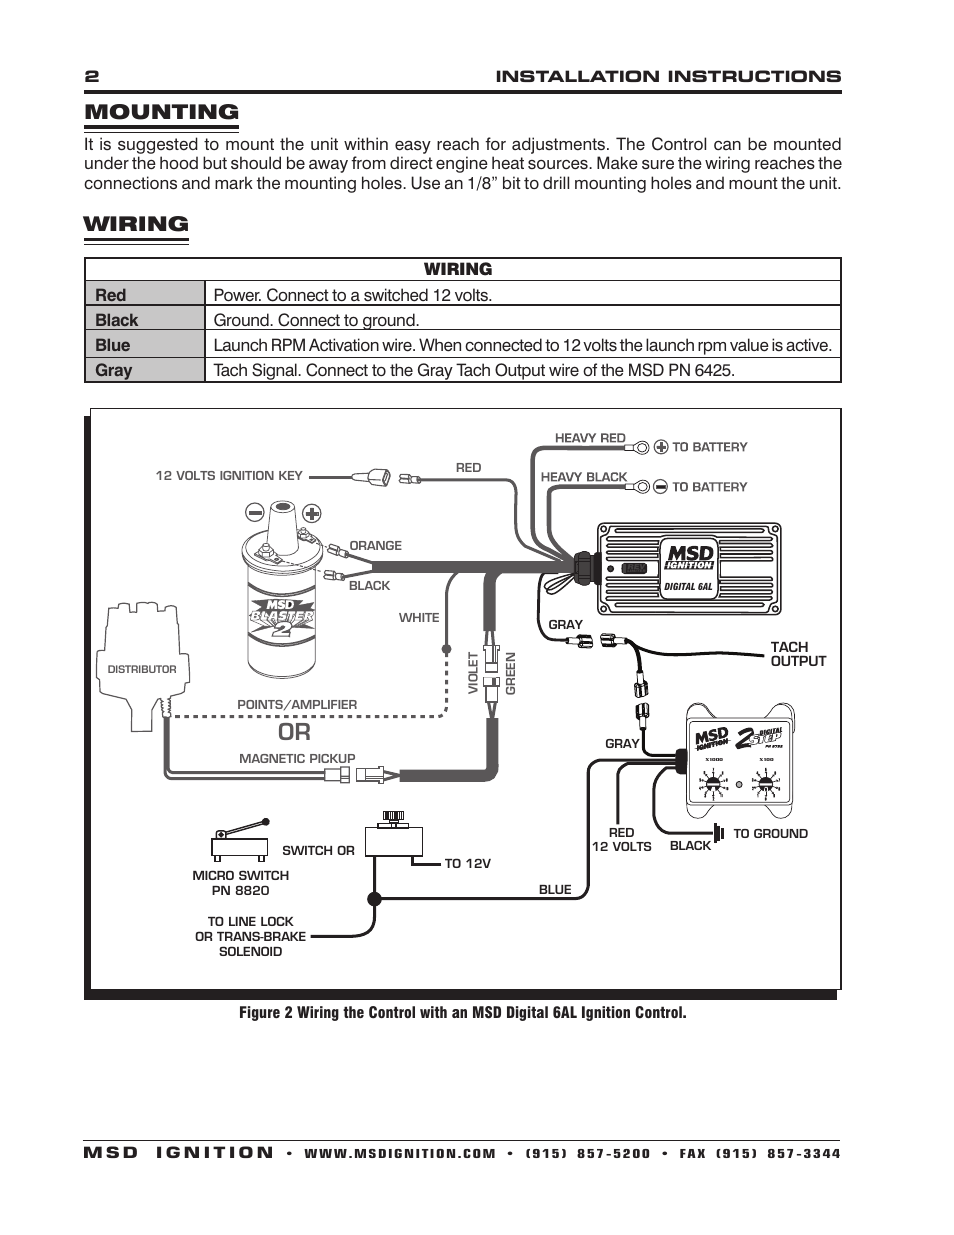 msd 6420 wiring diagrams wiring diagram msd 6420 wiring diagrams diagram 2 step 6a ford a printable  sc 1 st  Wiring Diagrams : msd 6420 wiring - yogabreezes.com